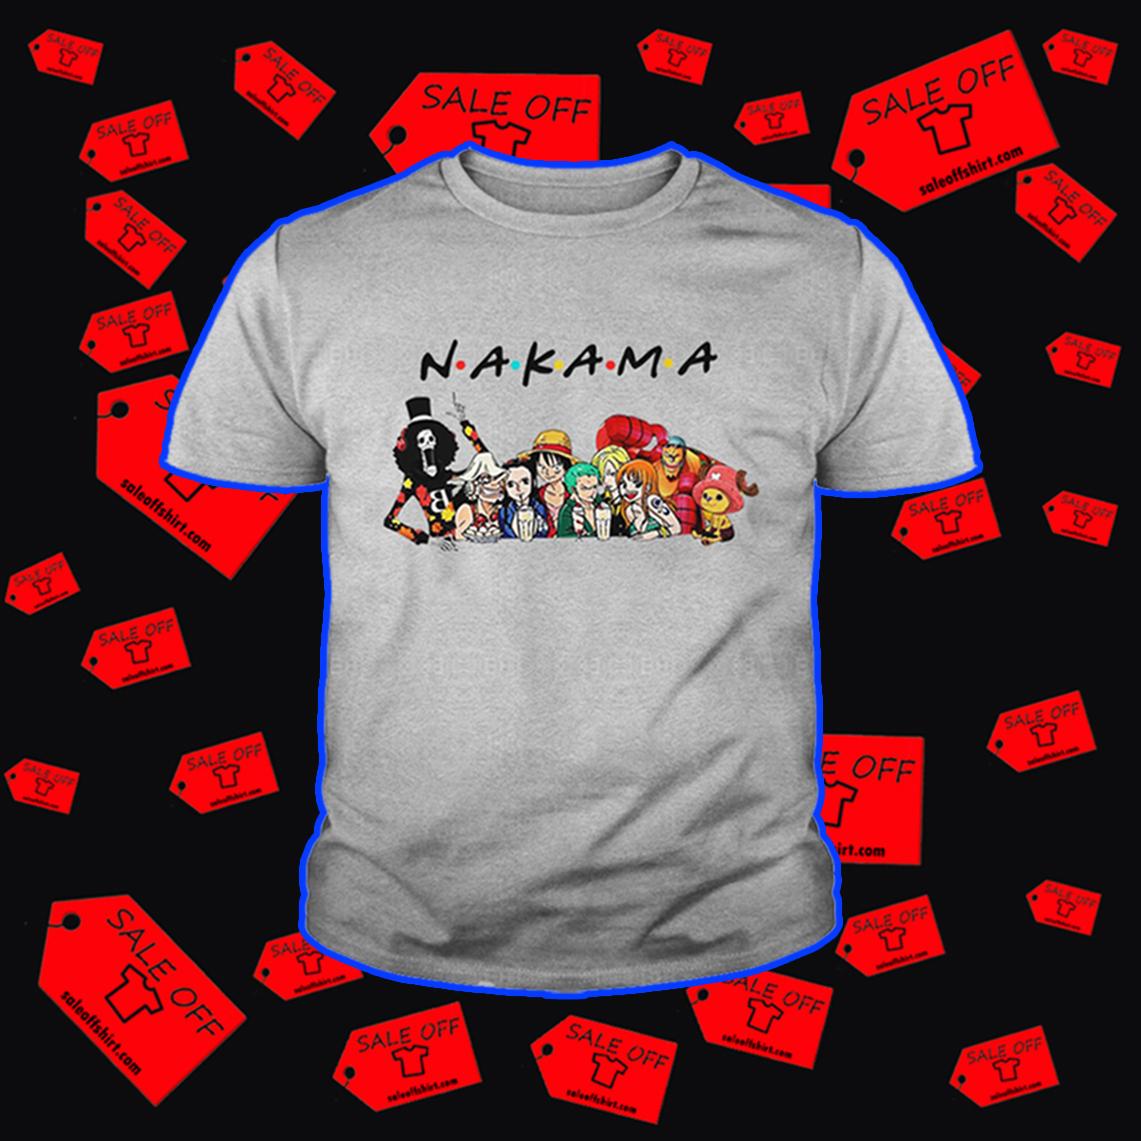 (SALE OFF) Nakama One Piece Friends shirt, hoodie, tank top